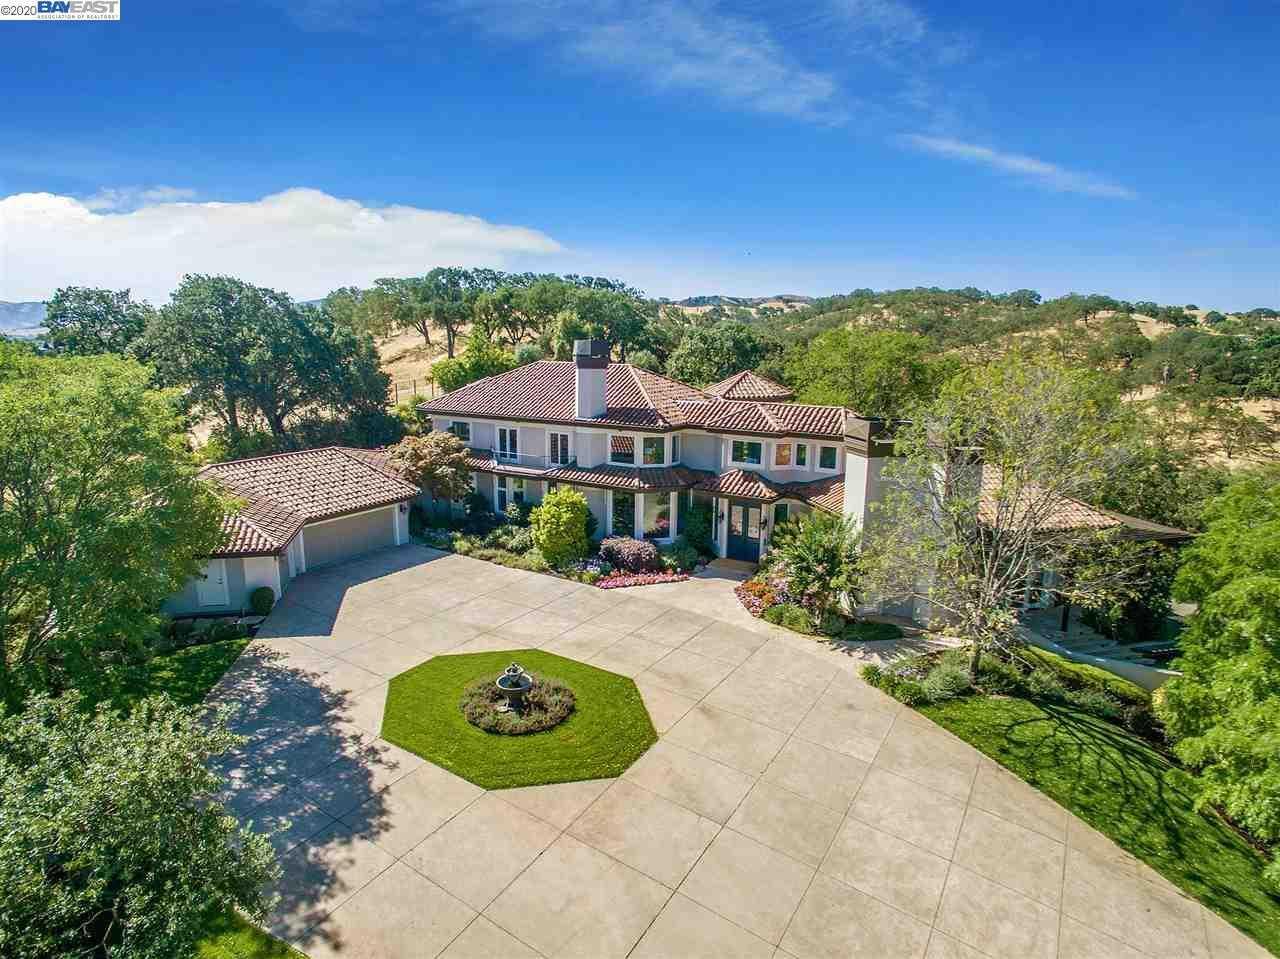 $4,250,000 - 4Br/4Ba -  for Sale in Country Vineyard, Pleasanton